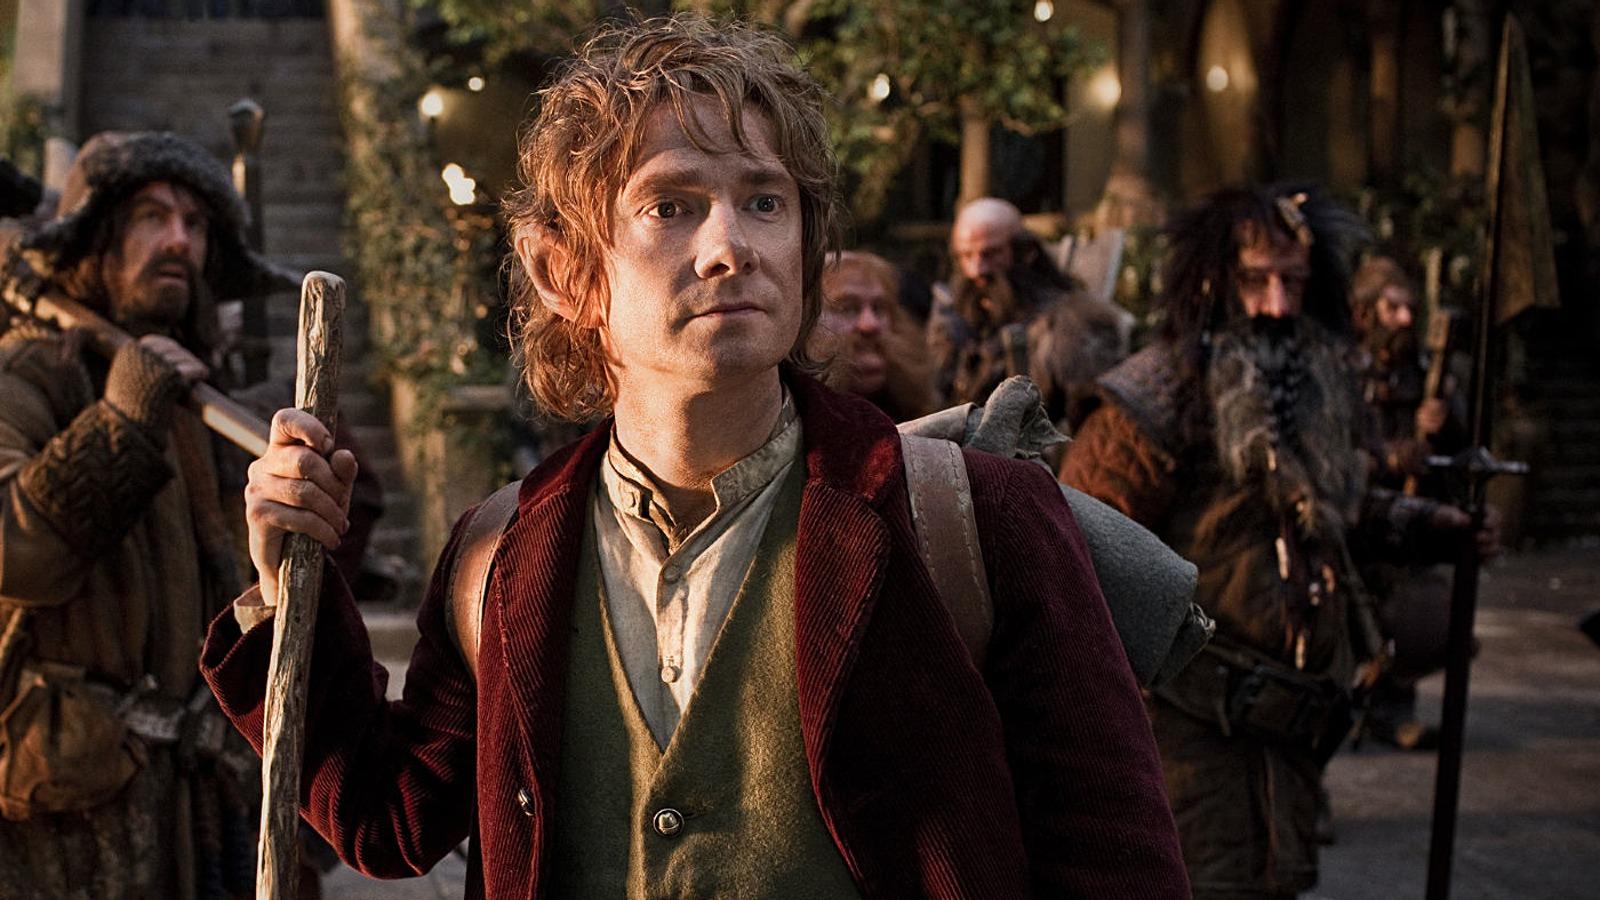 The Hobbit image